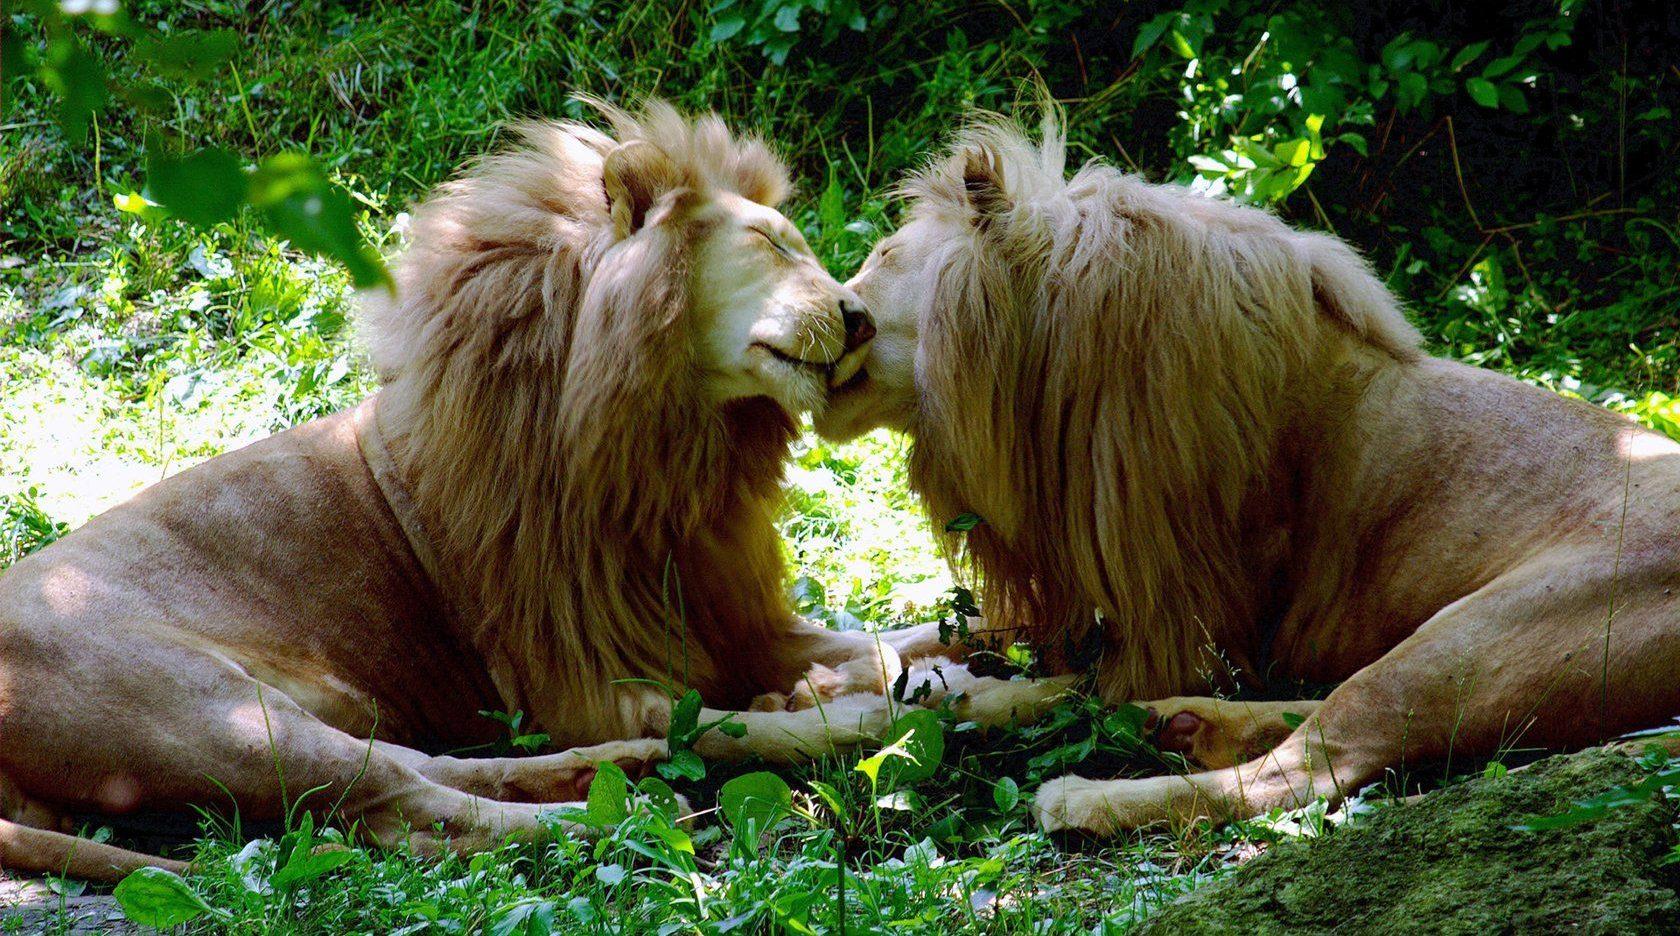 Amsterdam Hayvanat Bahçesi Onur'u, Hayvanlar Alemindeki Eşcinsellik Turu İle Kutluyor!